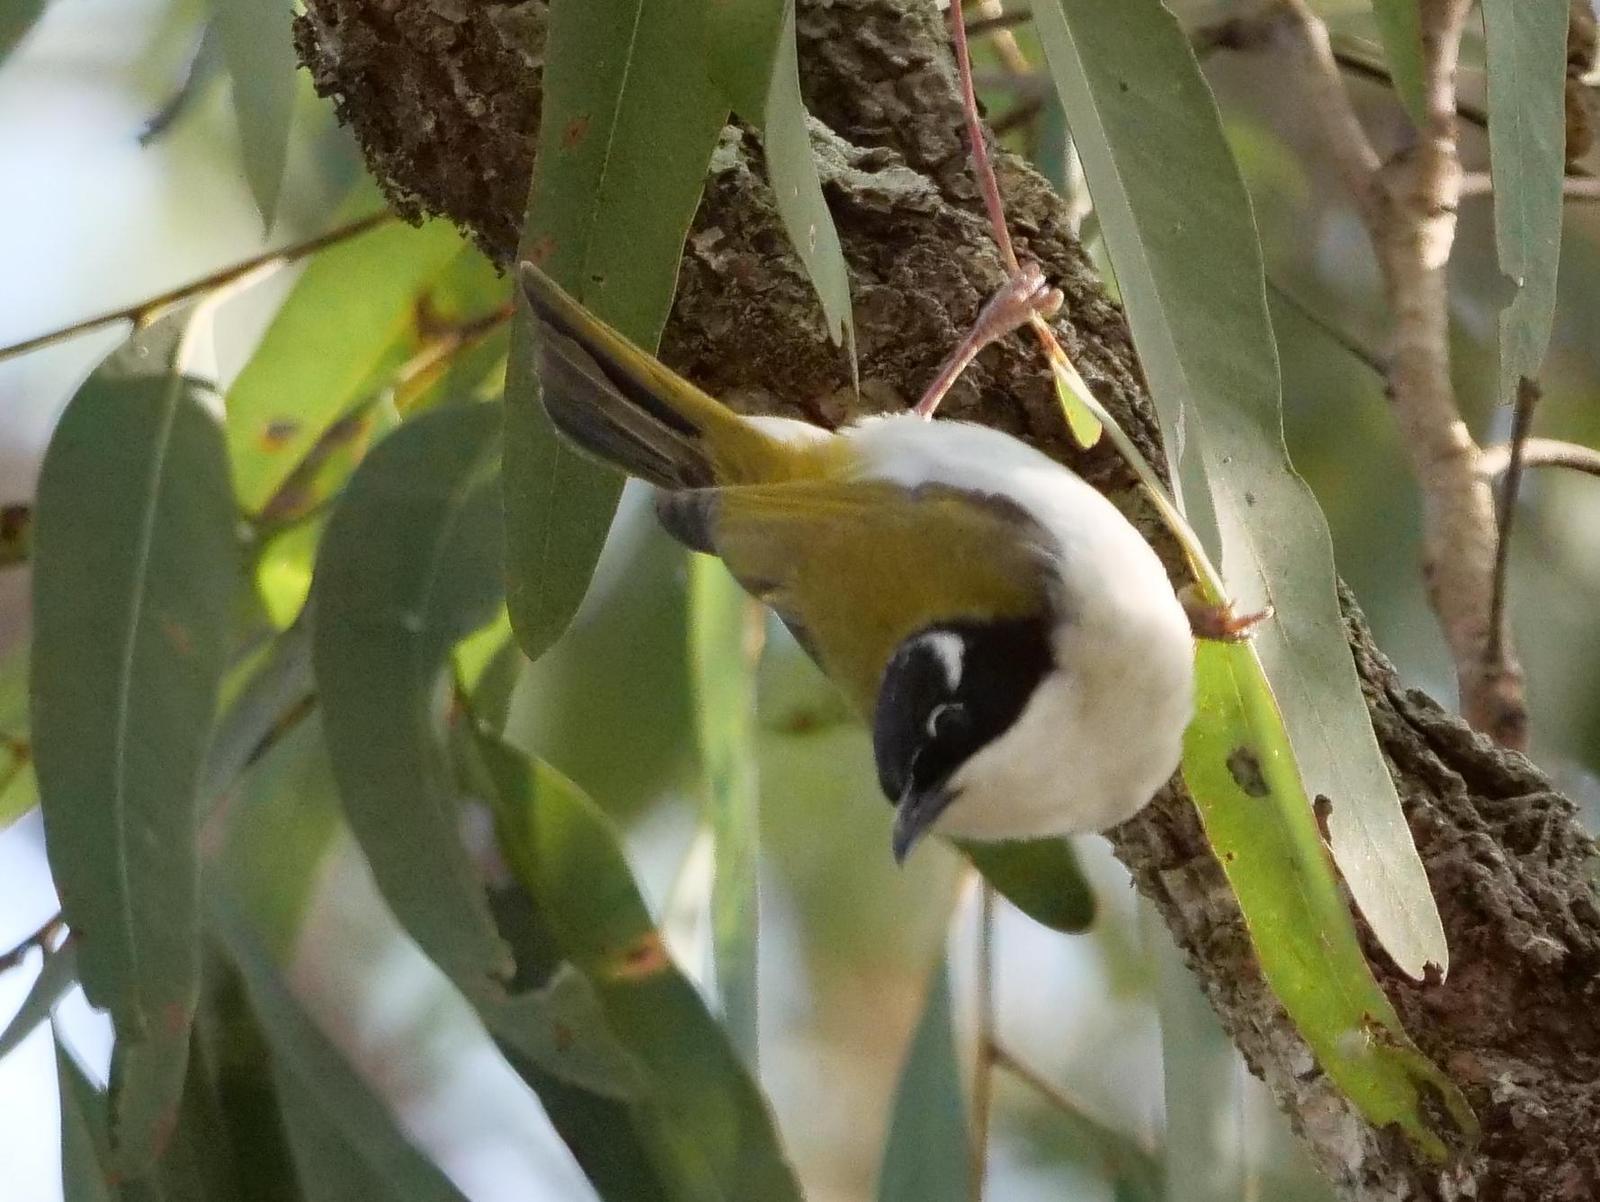 White-throated Honeyeater Photo by Peter Lowe